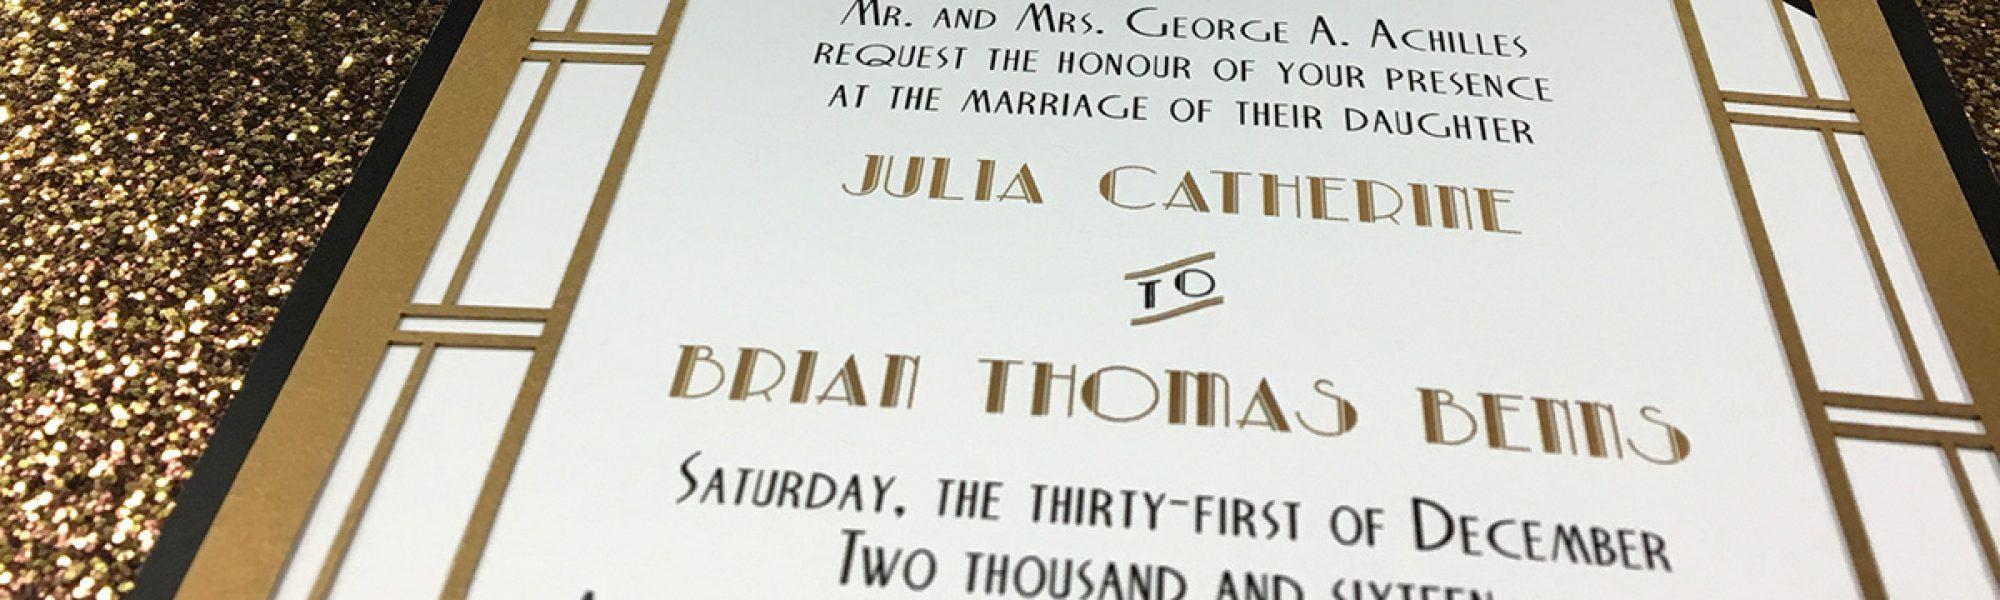 Art Deco metallic wedding invitation